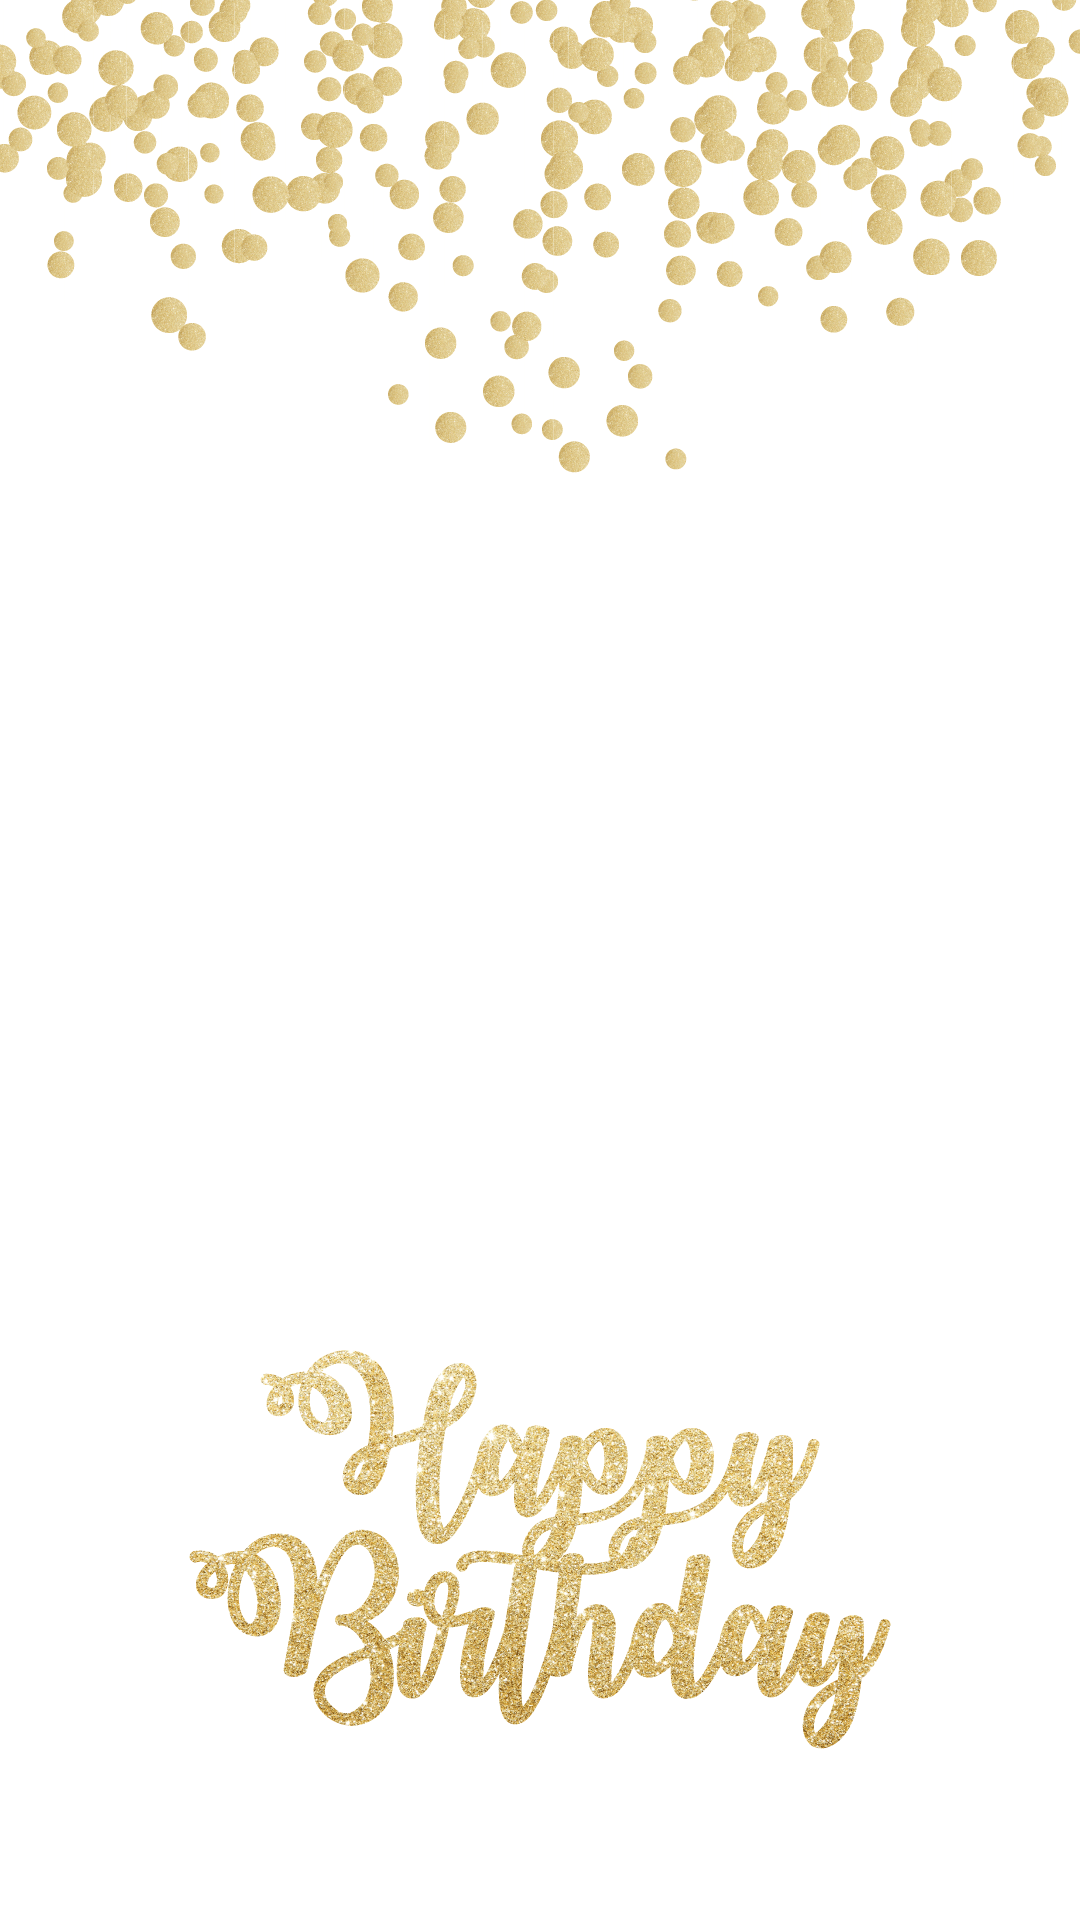 Clip art golden transprent. Glitter clipart gold glitter line